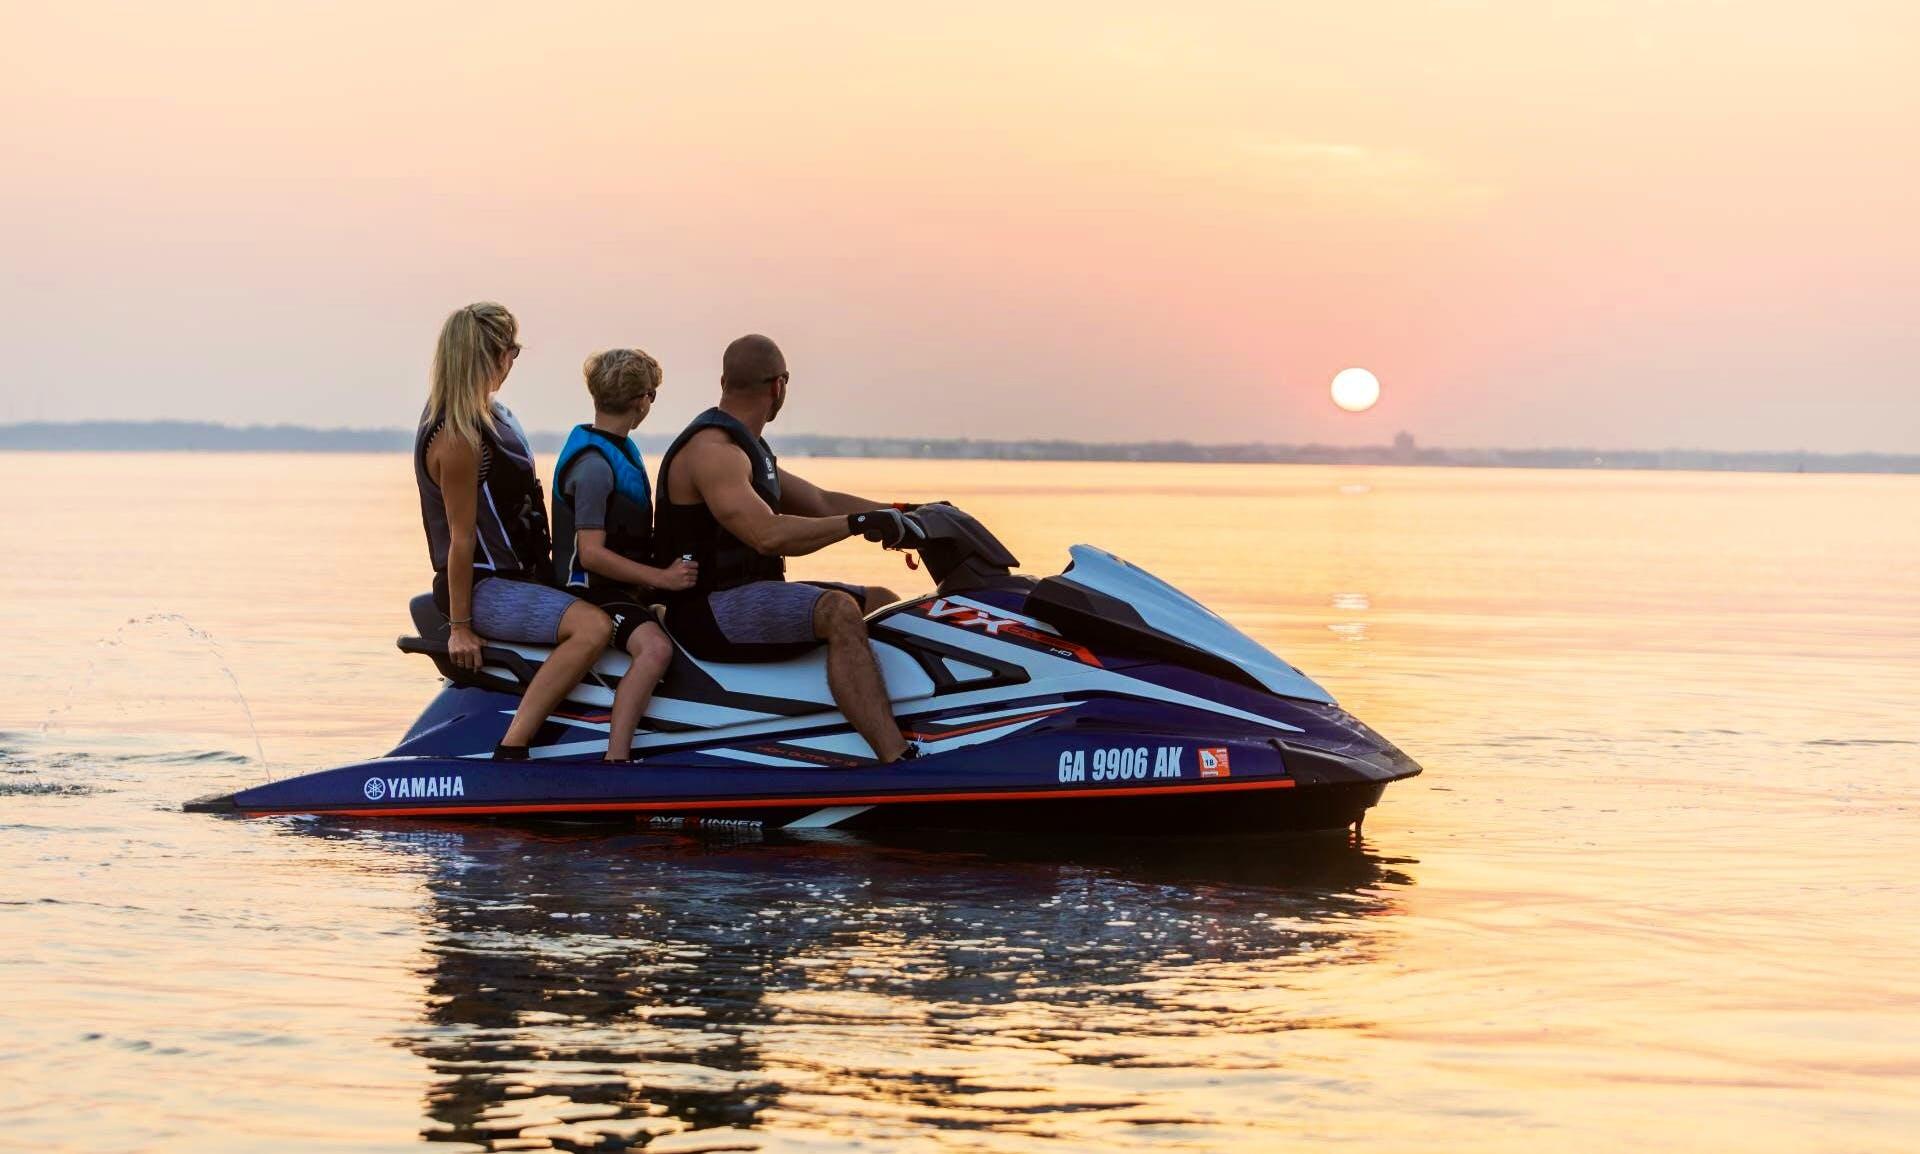 2019 Yamaha VX Cruiser Ho 1.8 Jet Ski Rental In Miami, Florida